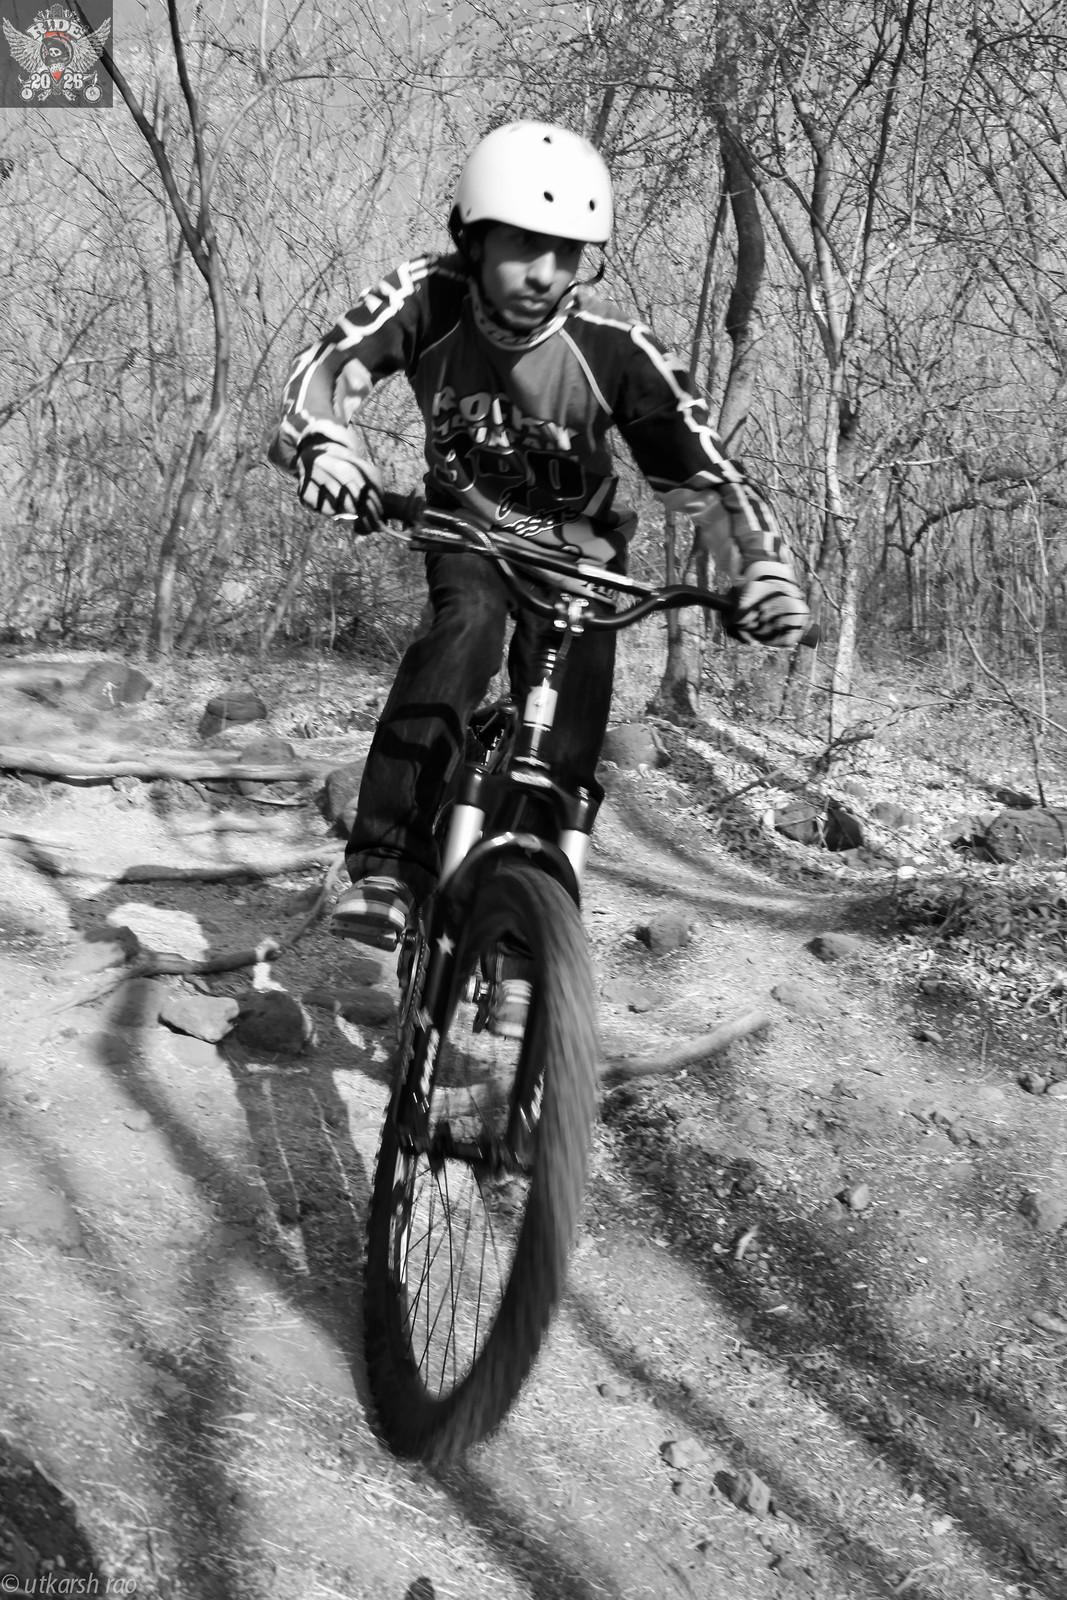 MG 4371 2 - utkarsh rao - Mountain Biking Pictures - Vital MTB